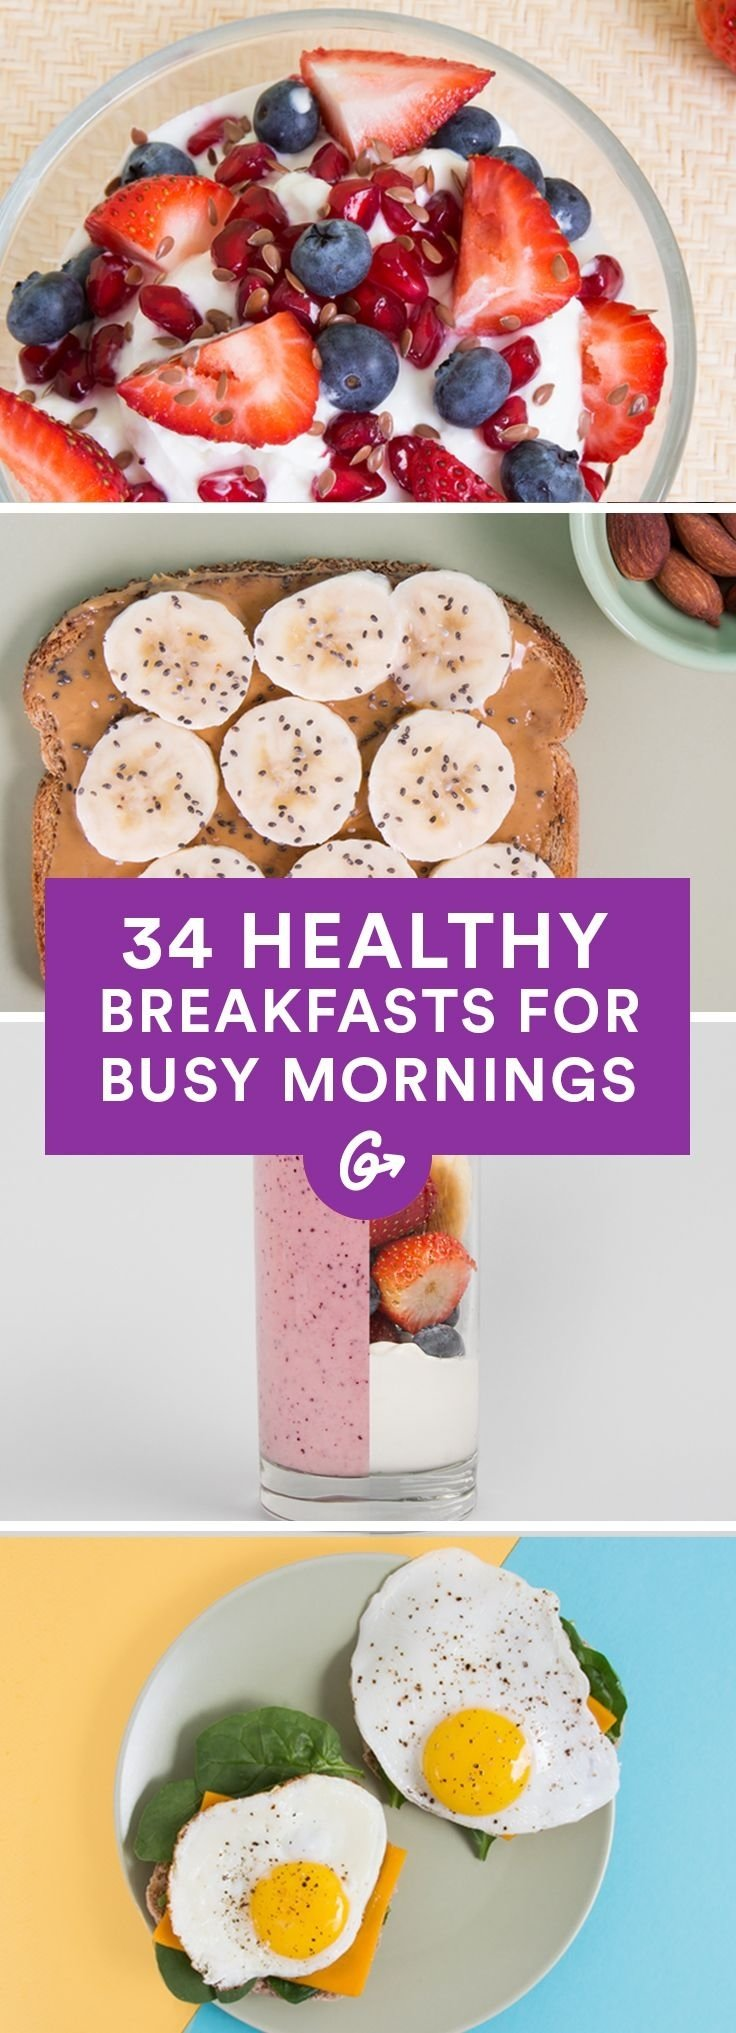 10 Trendy Healthy Breakfast Ideas On The Go 39 healthy breakfasts for busy mornings healthy breakfasts 2020